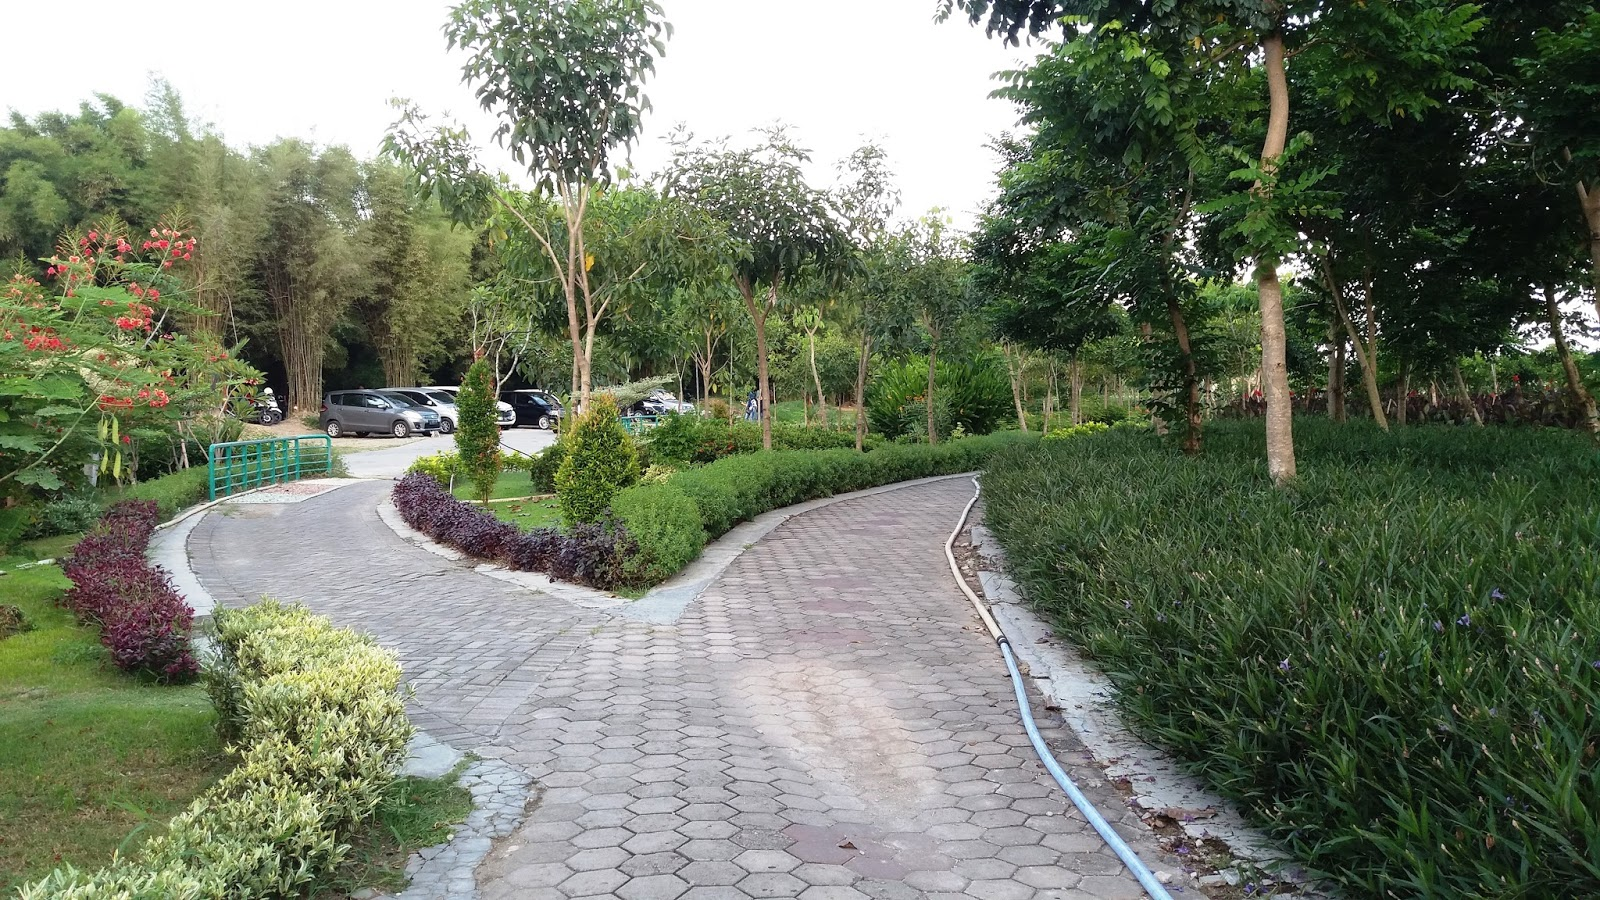 Wisata Surabaya Taman Bunga Sakura Keputih Haya Zone View Kota